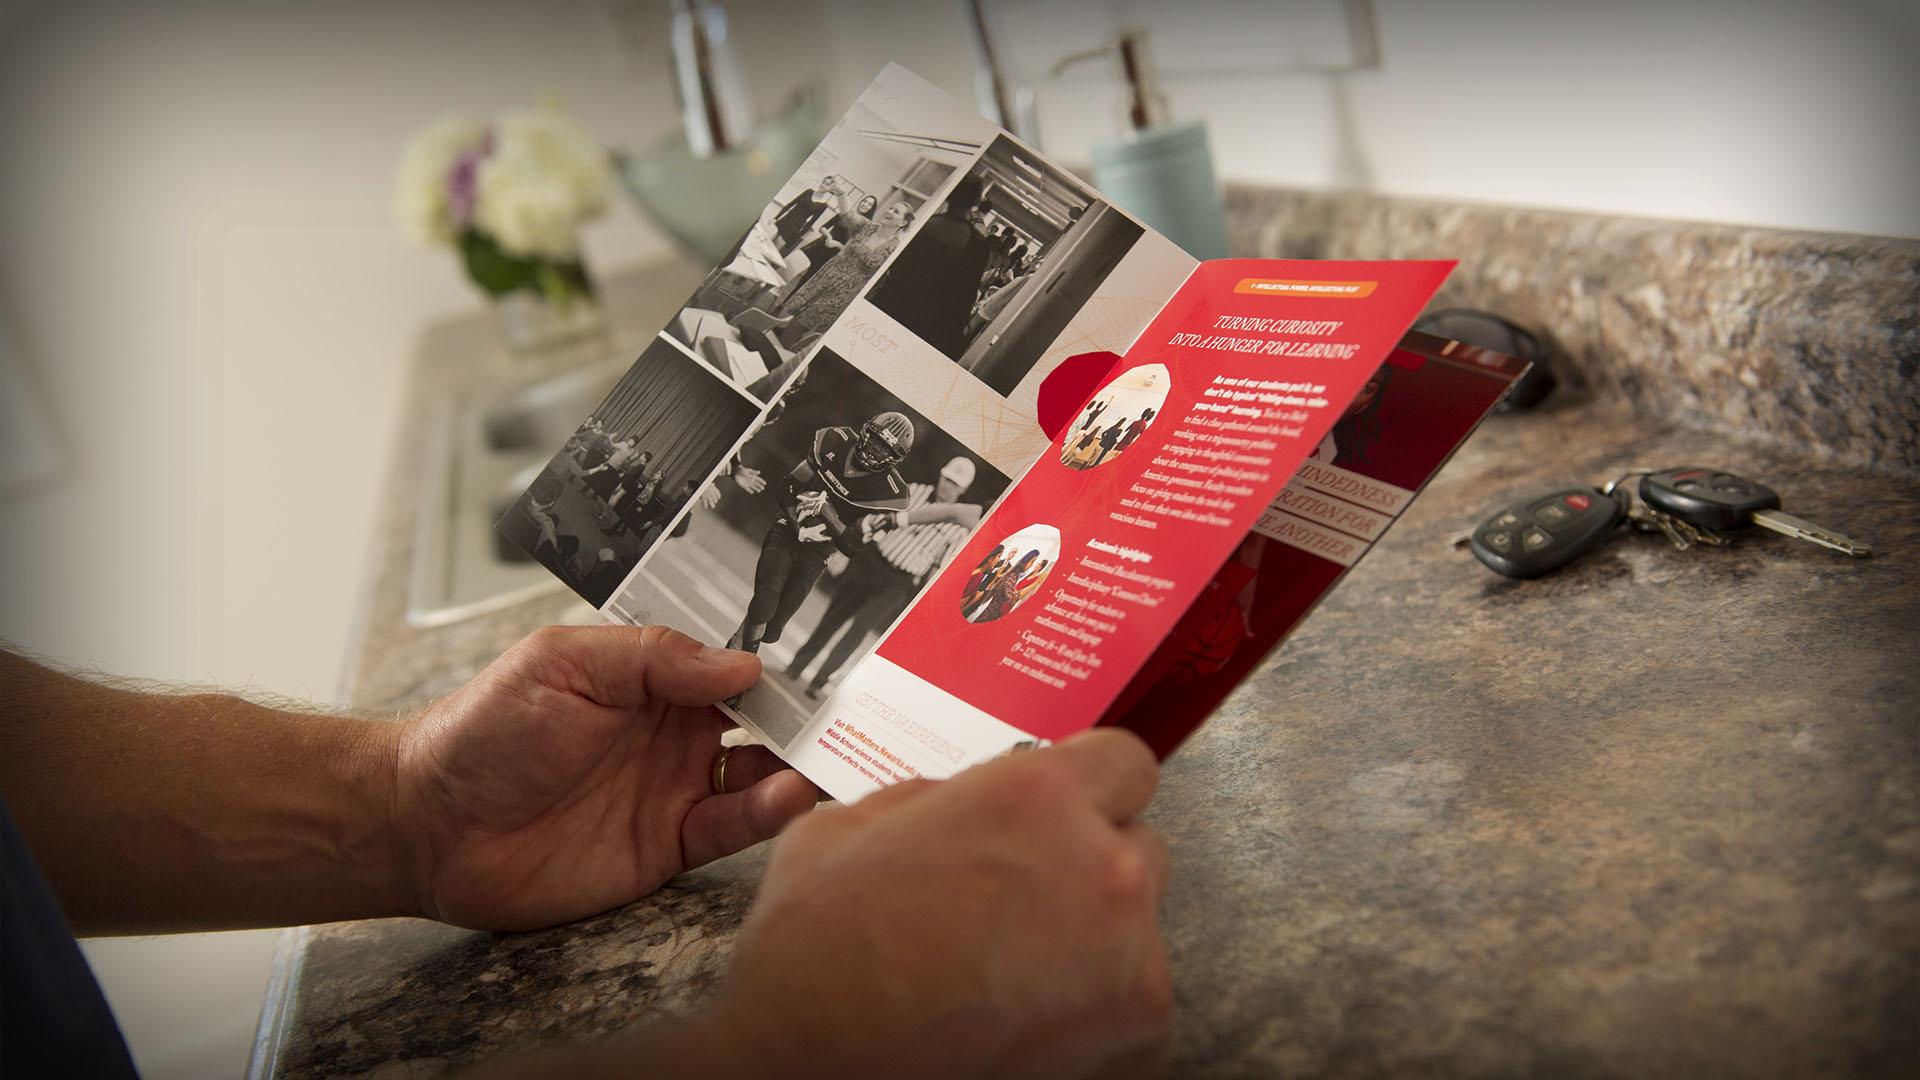 Newark-Academy-Branding-Marketing-Admissions-Mini-Viewbook-3.jpg